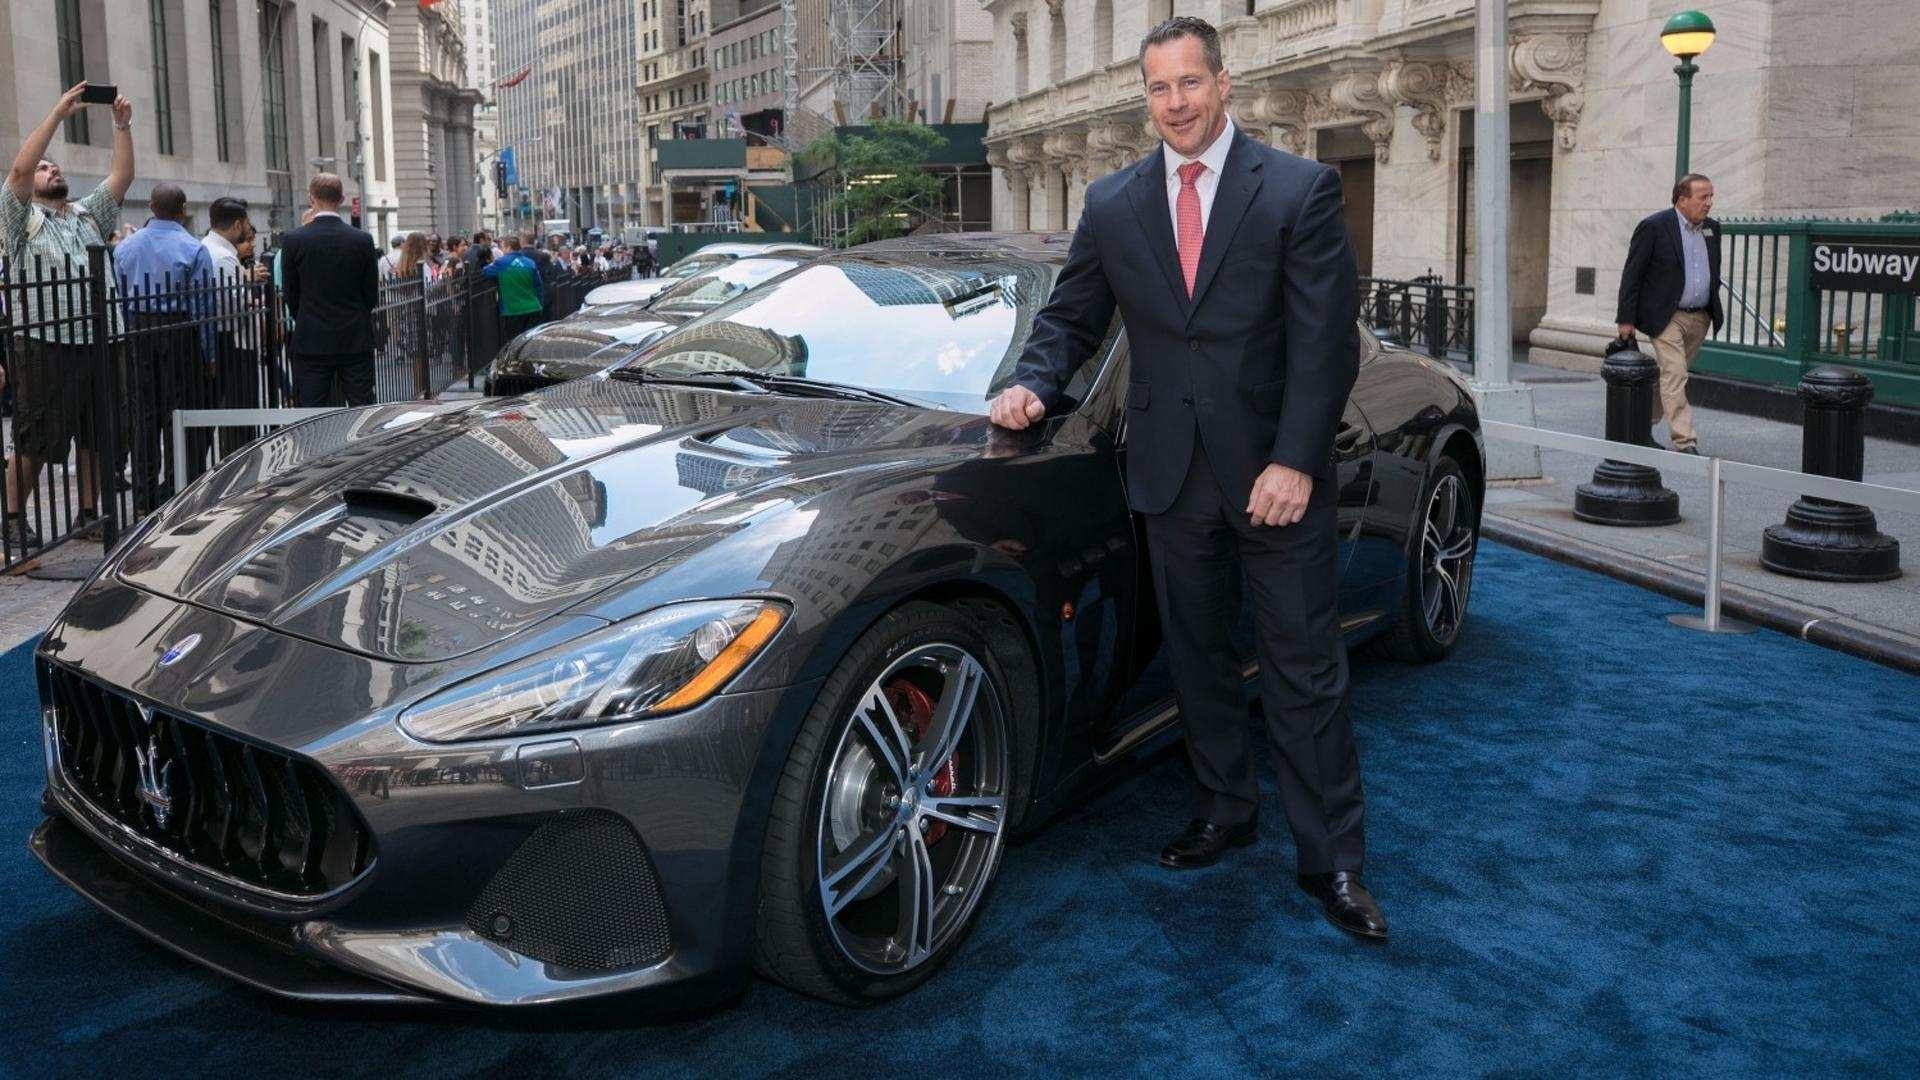 72 New New Maserati 2020 Specs for New Maserati 2020